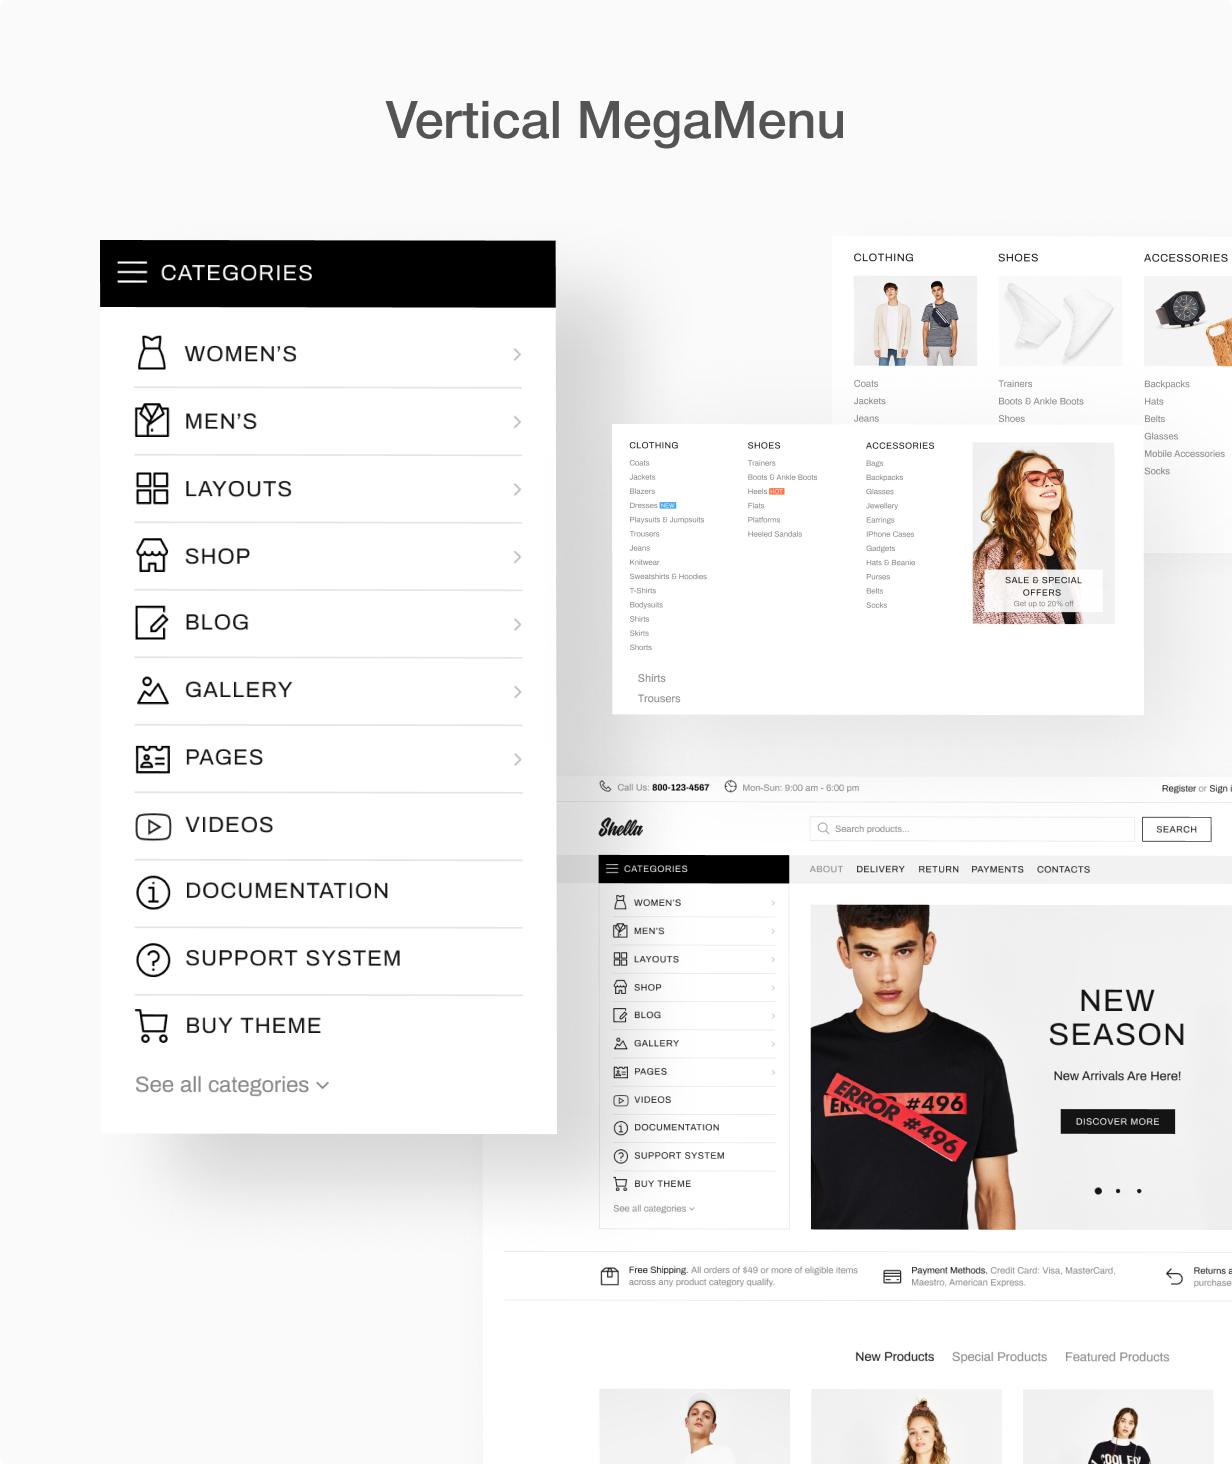 12 2 vertical mega menu - Shella - Multipurpose Shopify theme, fastest with the banner builder